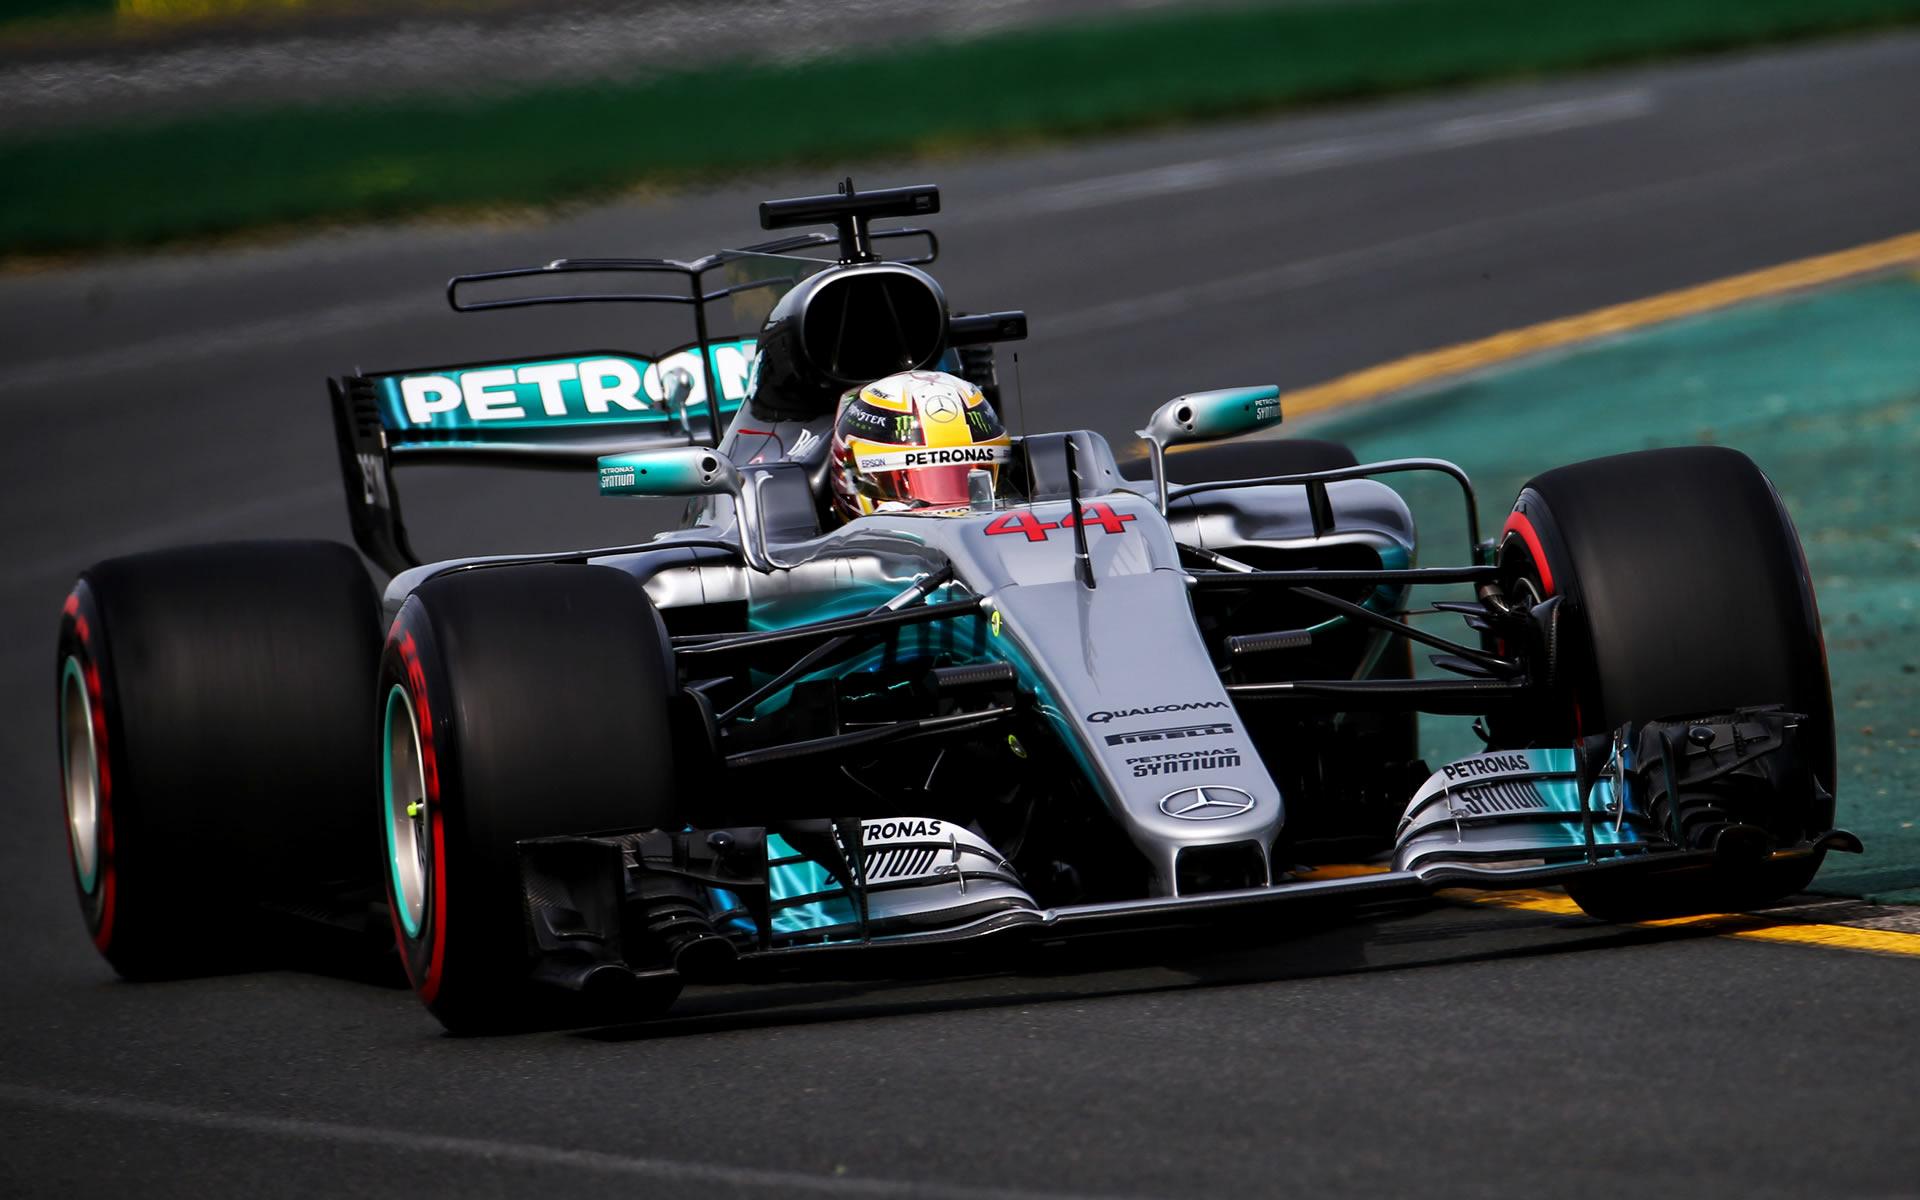 Mclaren 2015 F1 Car Wallpaper 2017 Mercedes Amg F1 W08 Eq Power Wallpapers And Hd